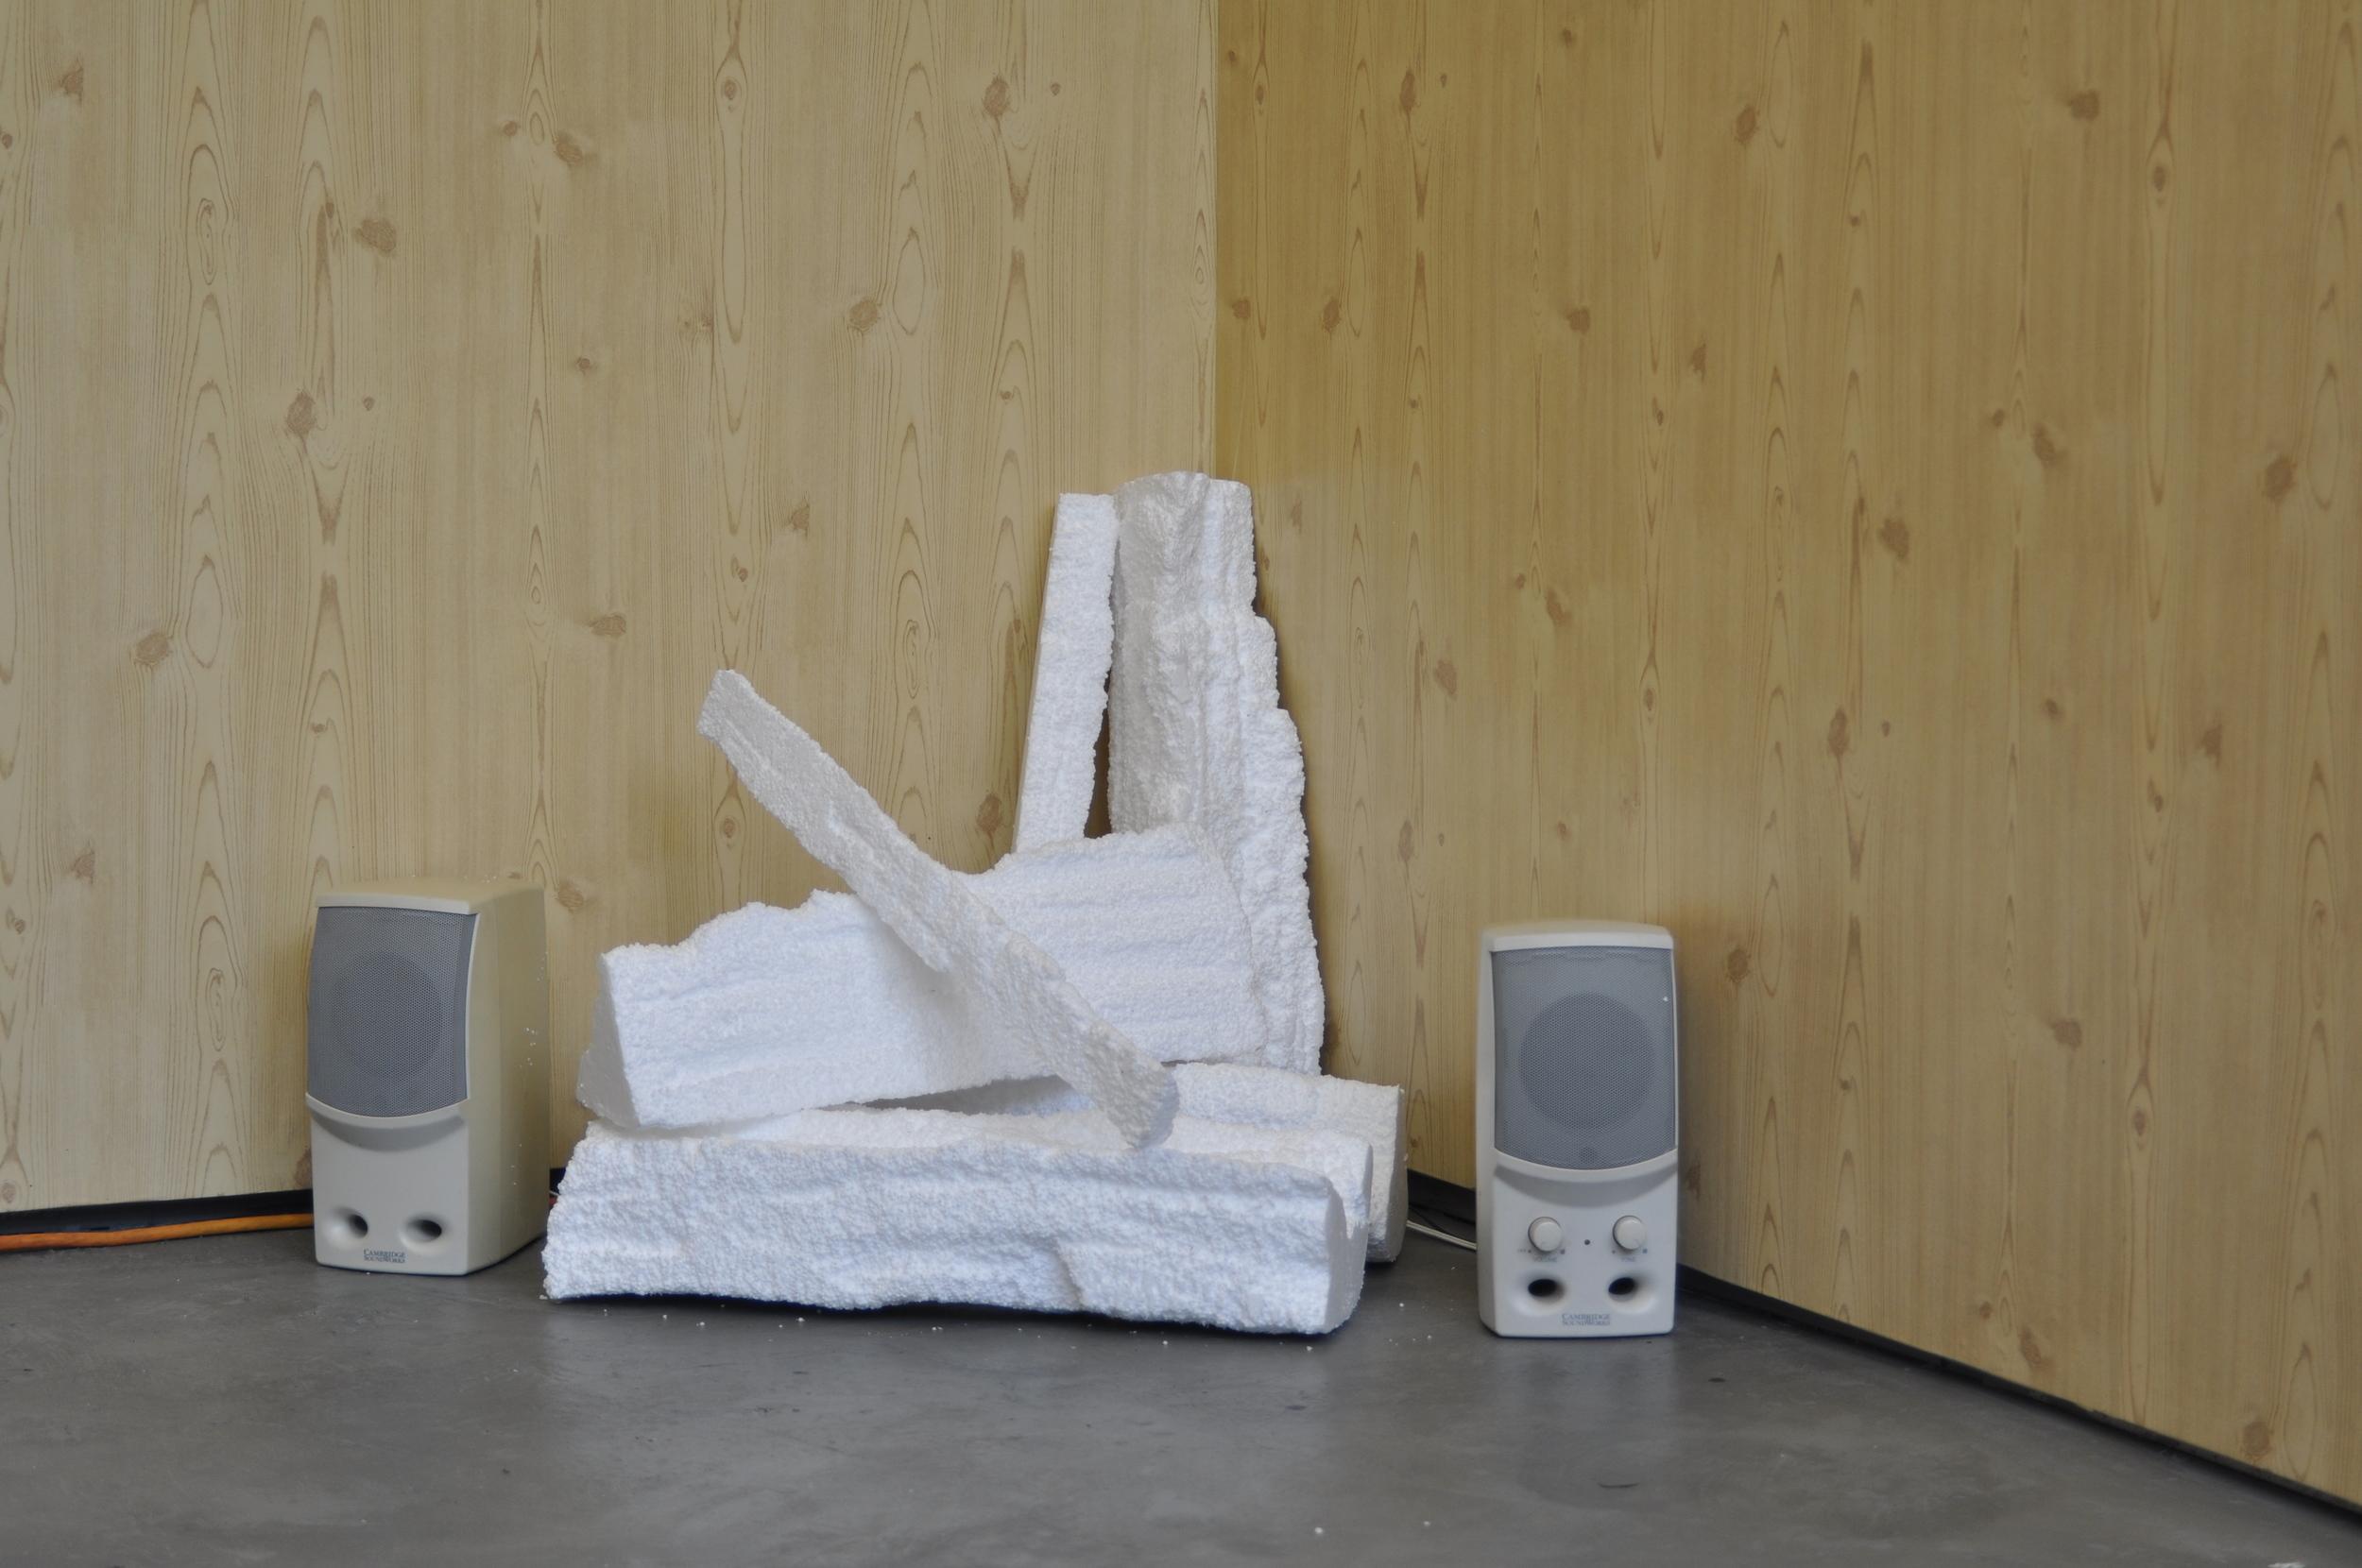 MERI'S ROOM   December 2011. SMFA Mission Hill Studios, Boston, MA. Mixed media installation; rigid insulation, Con-Tact paper, vintage poster, repurposed objects and audio. 10' x 13' square.